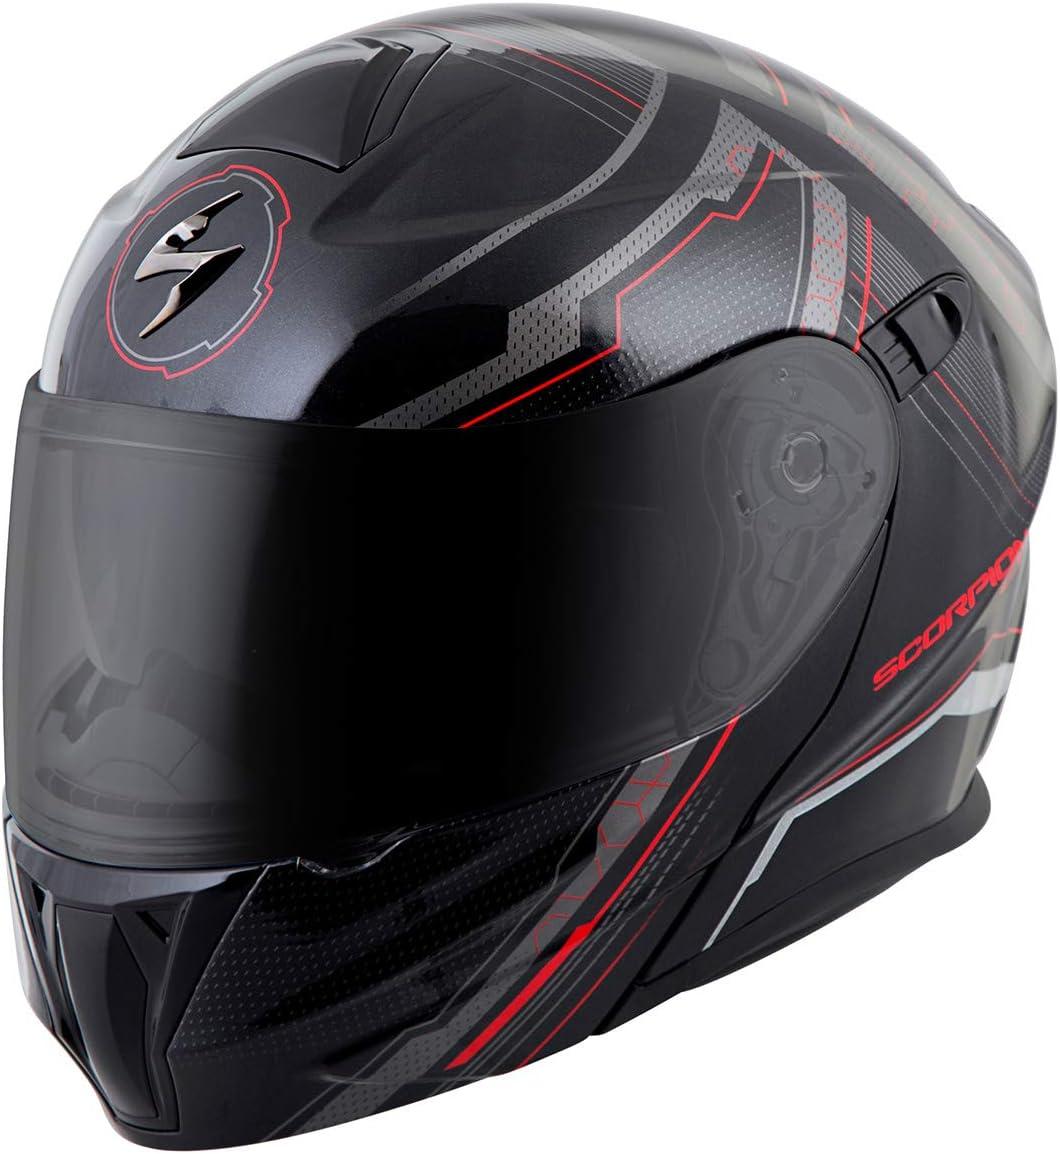 ScorpionExo EXO-GT920 Full Face Modular Helmet (Satellite Red, Small)